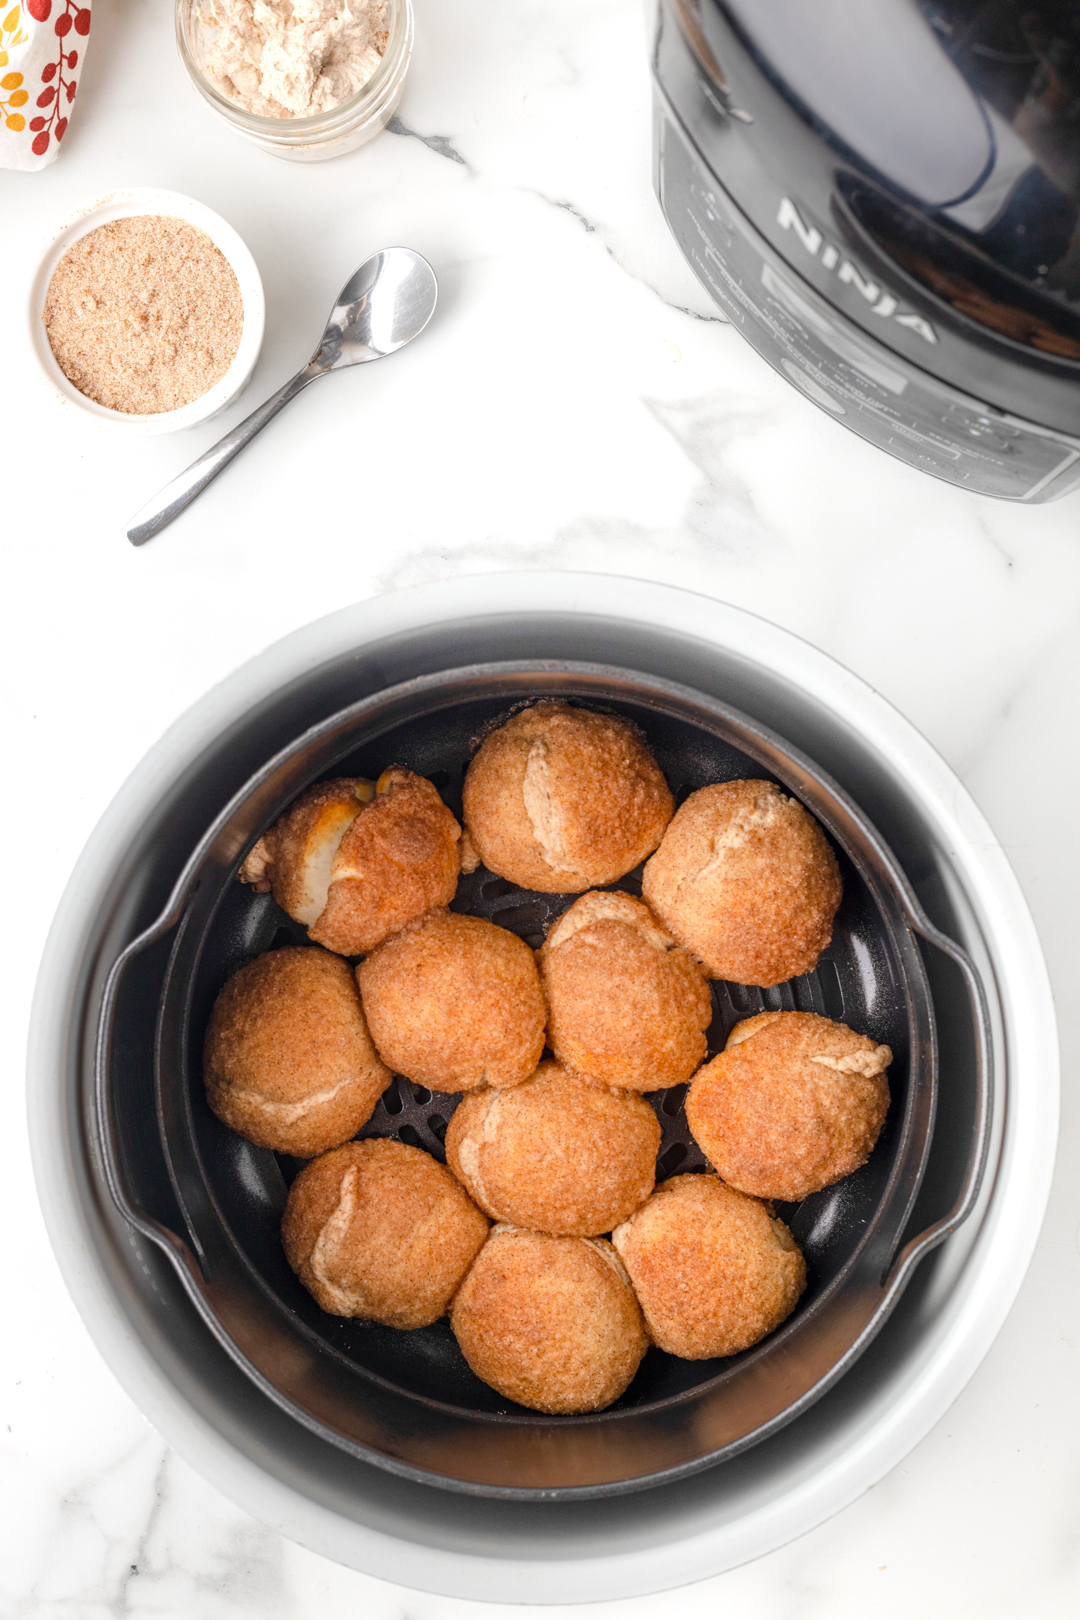 prepared donut bites in the air fryer